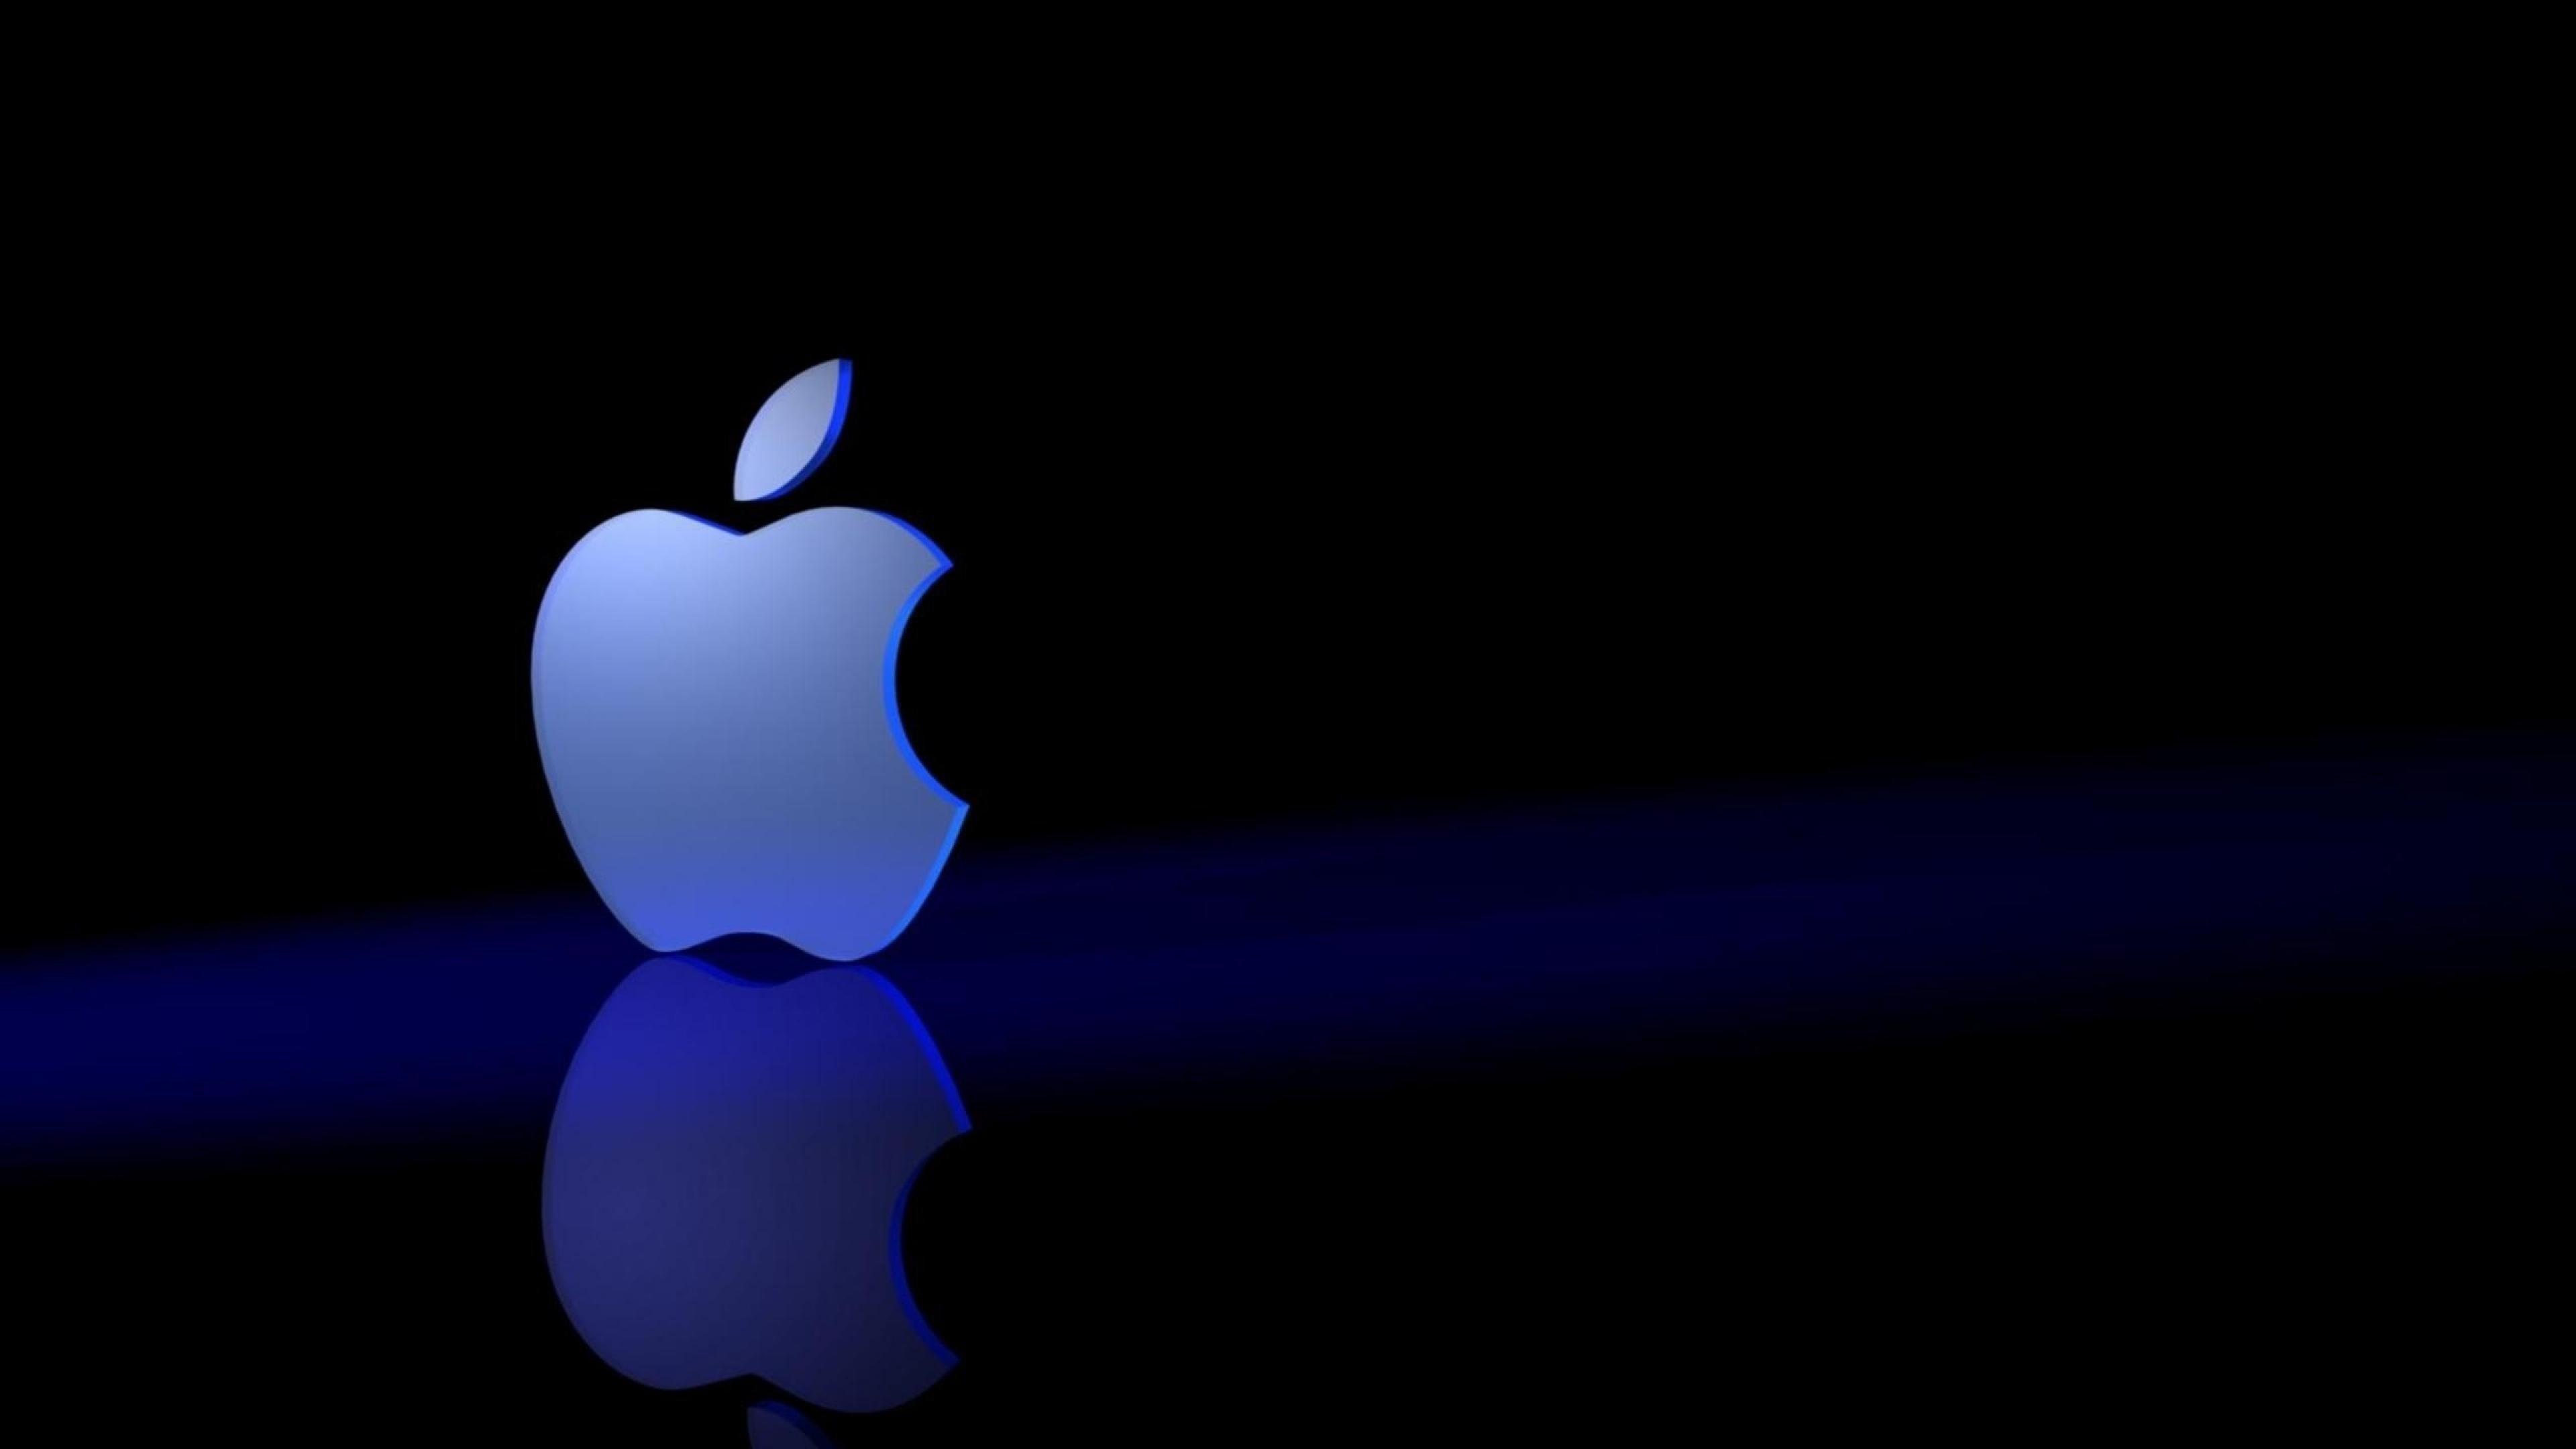 Res: 3840x2160, Apple 3d Wallpapers Hd Unique New Apple Logo Wallpaper for Desktop 26  Diarioveaonline Of Apple 3d